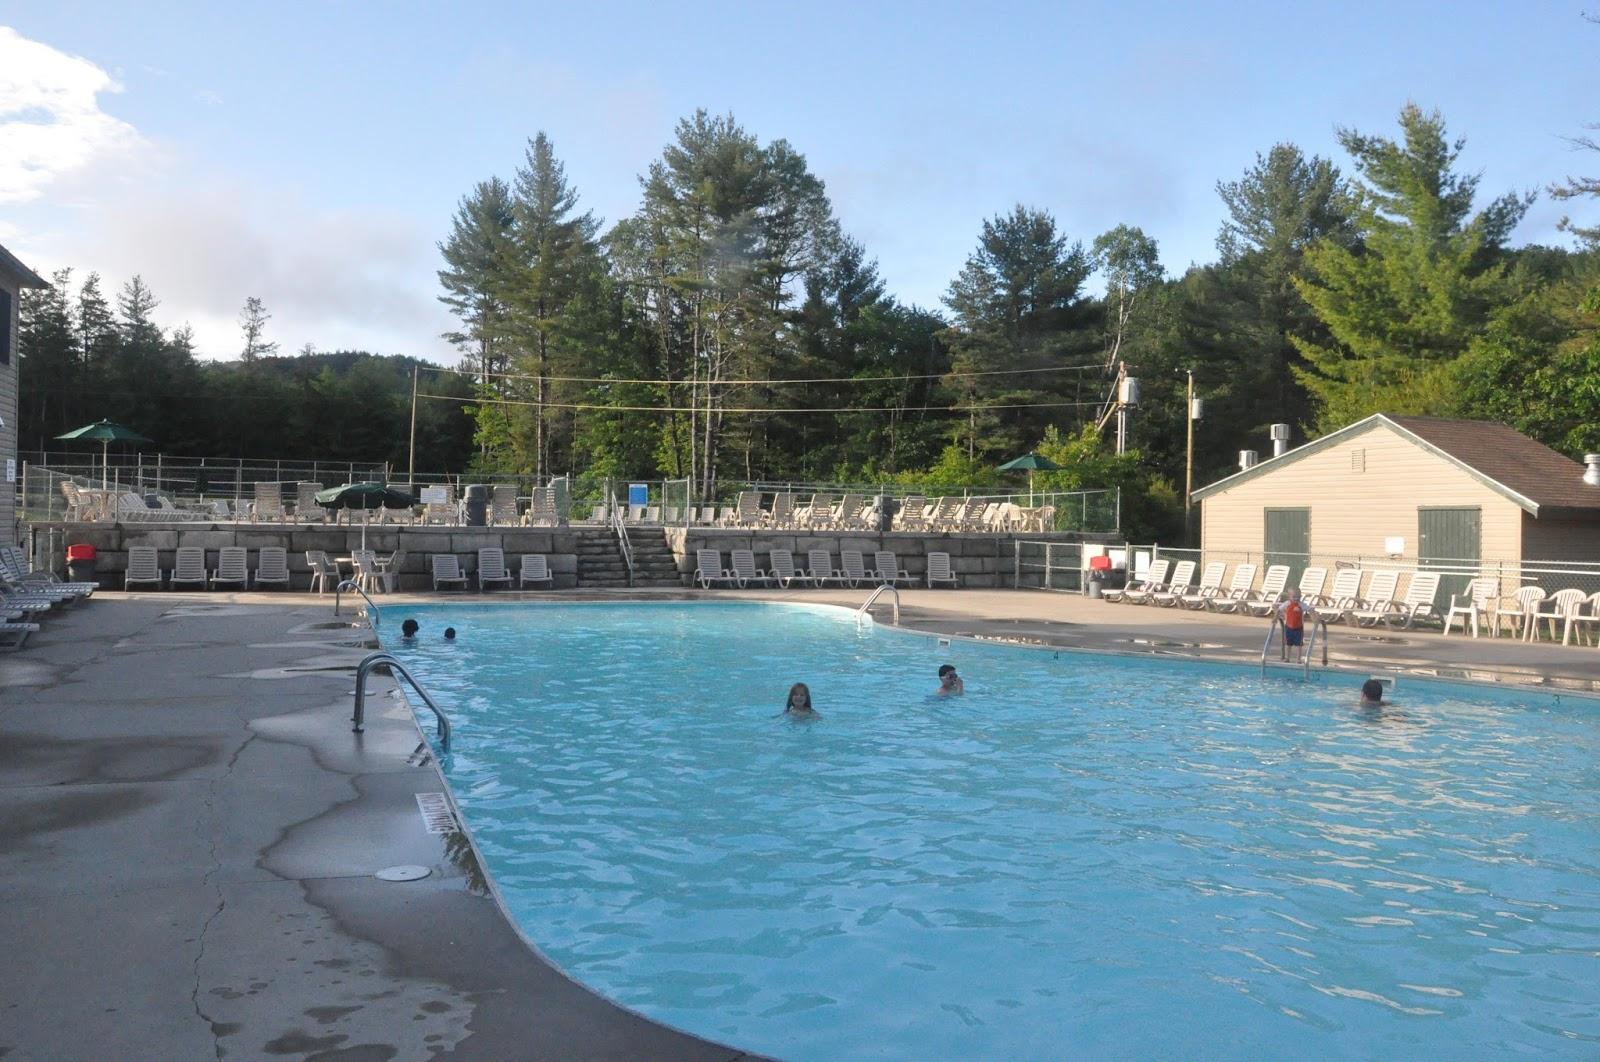 Casita Camping And Camping And Casitas Living Large At Danforth Bay Resort